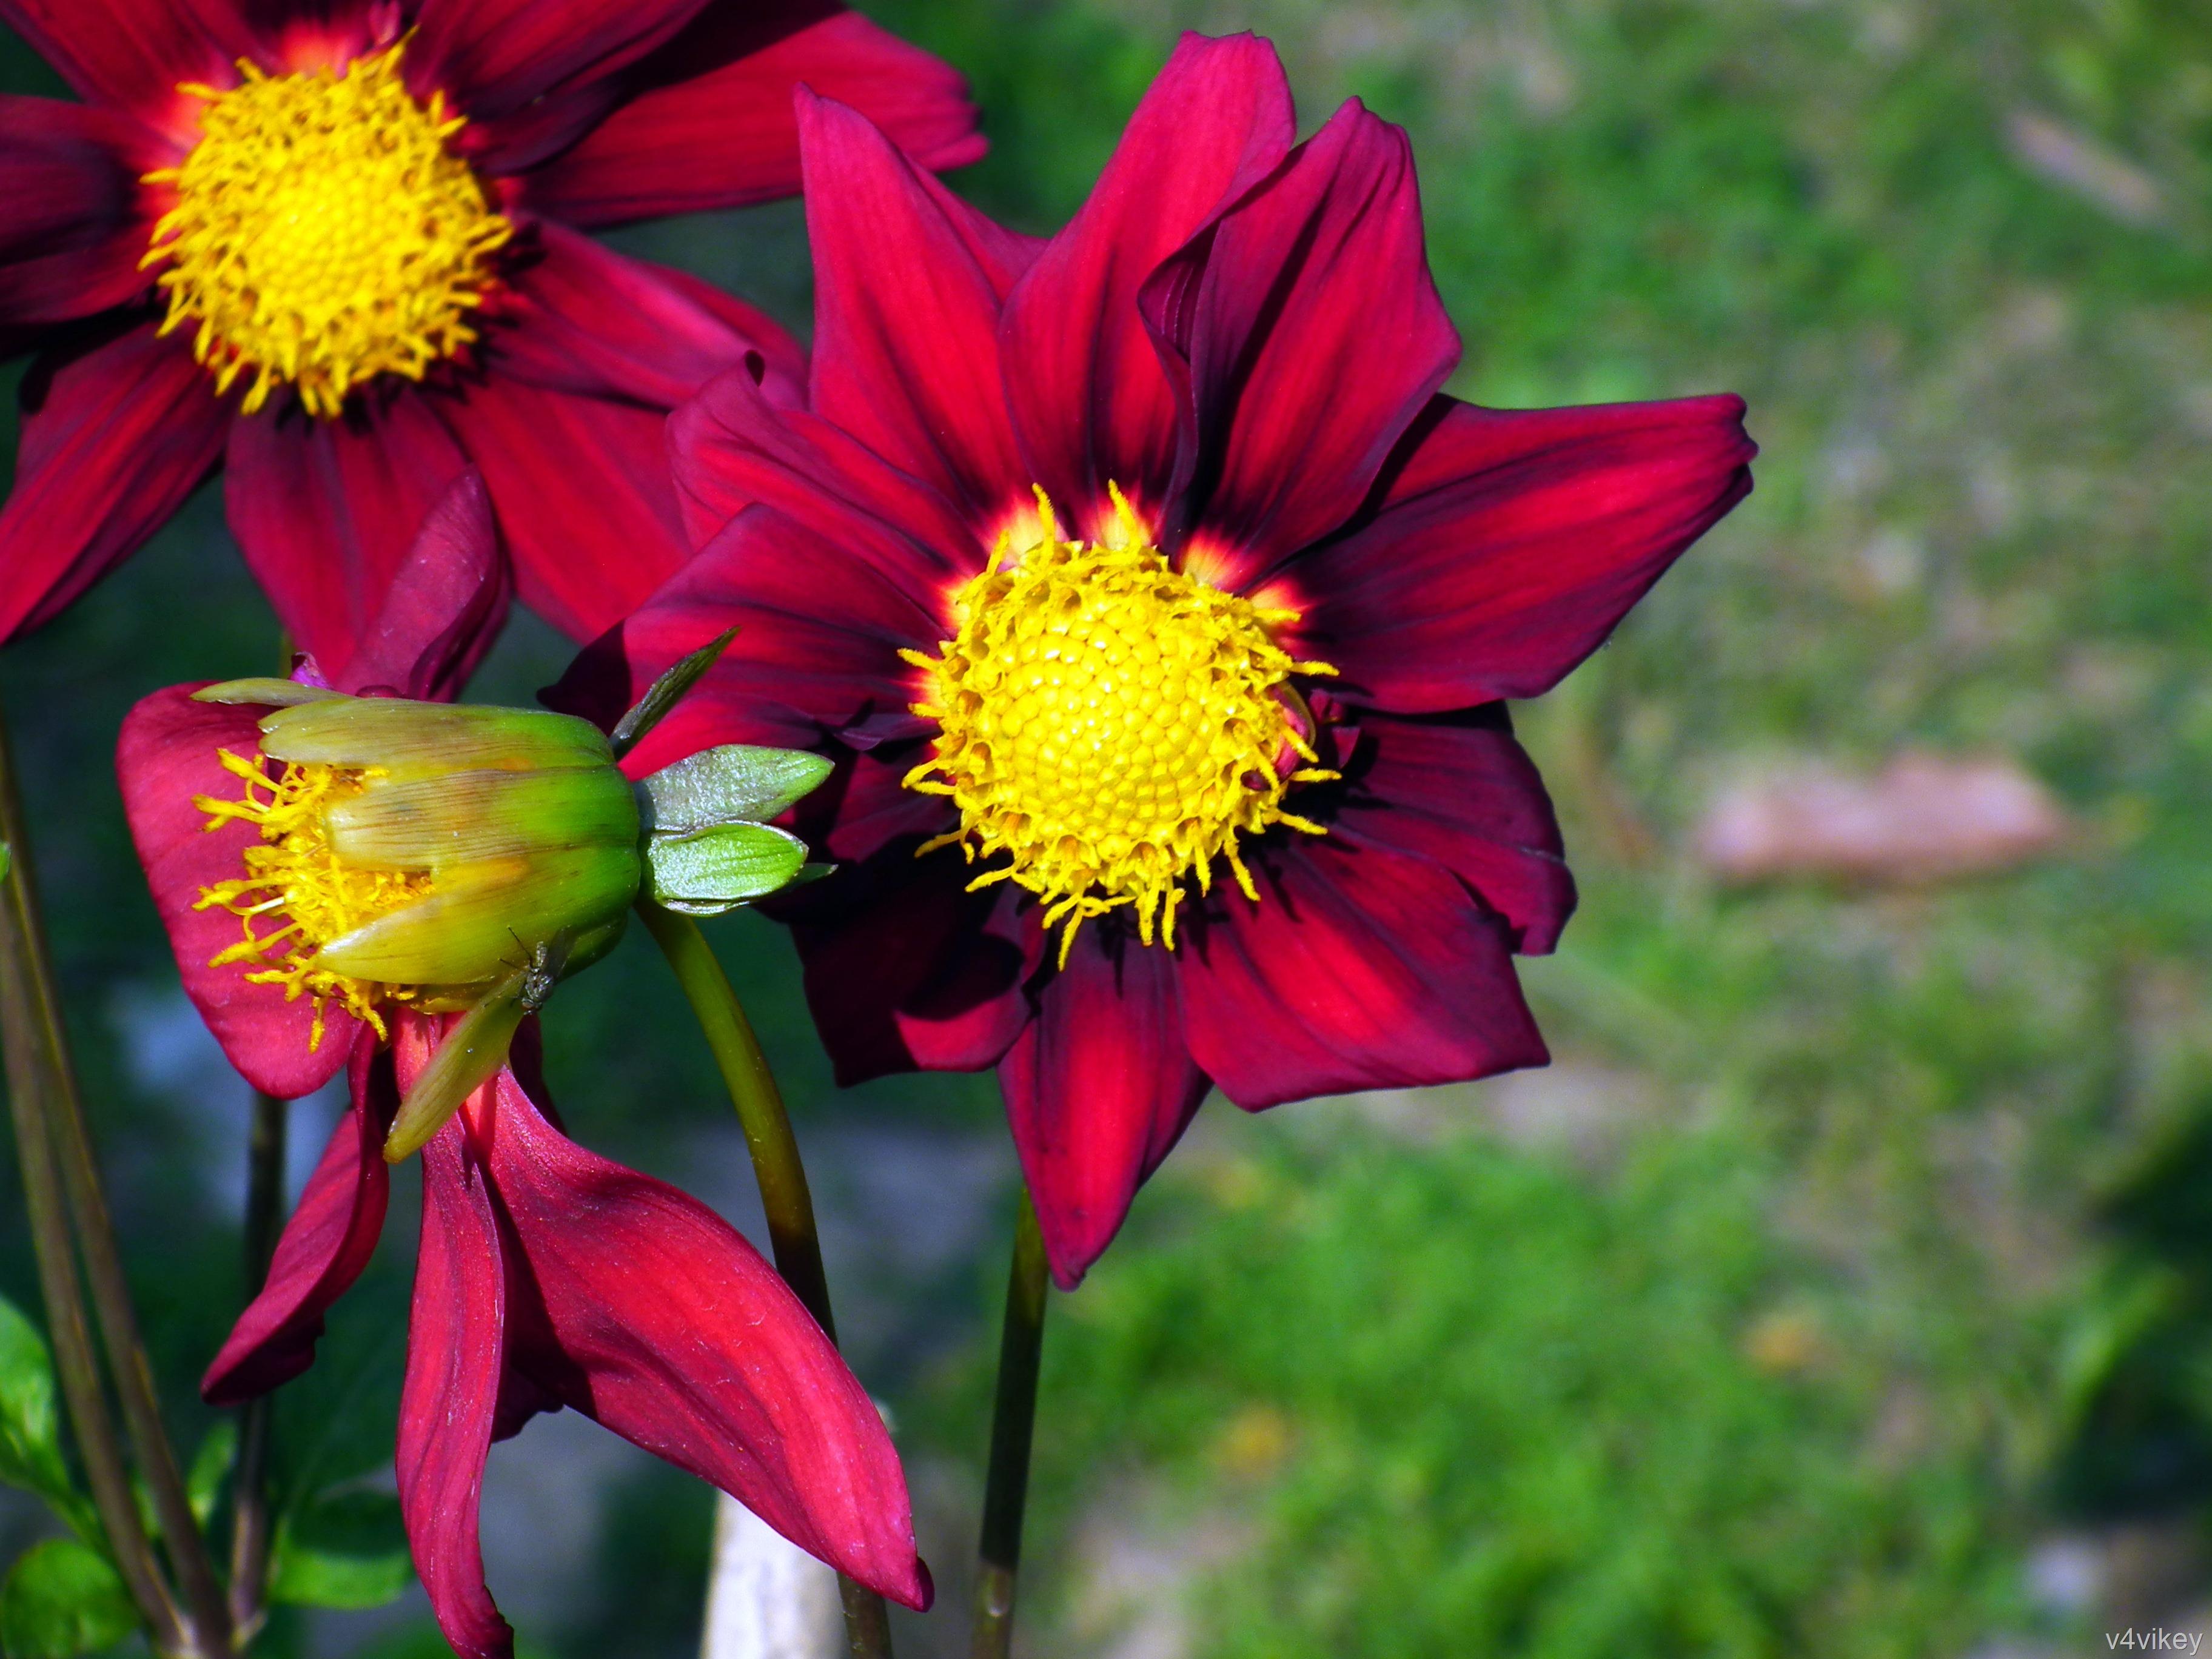 Deep Red Dahlia Flower Wallpaper Tadka